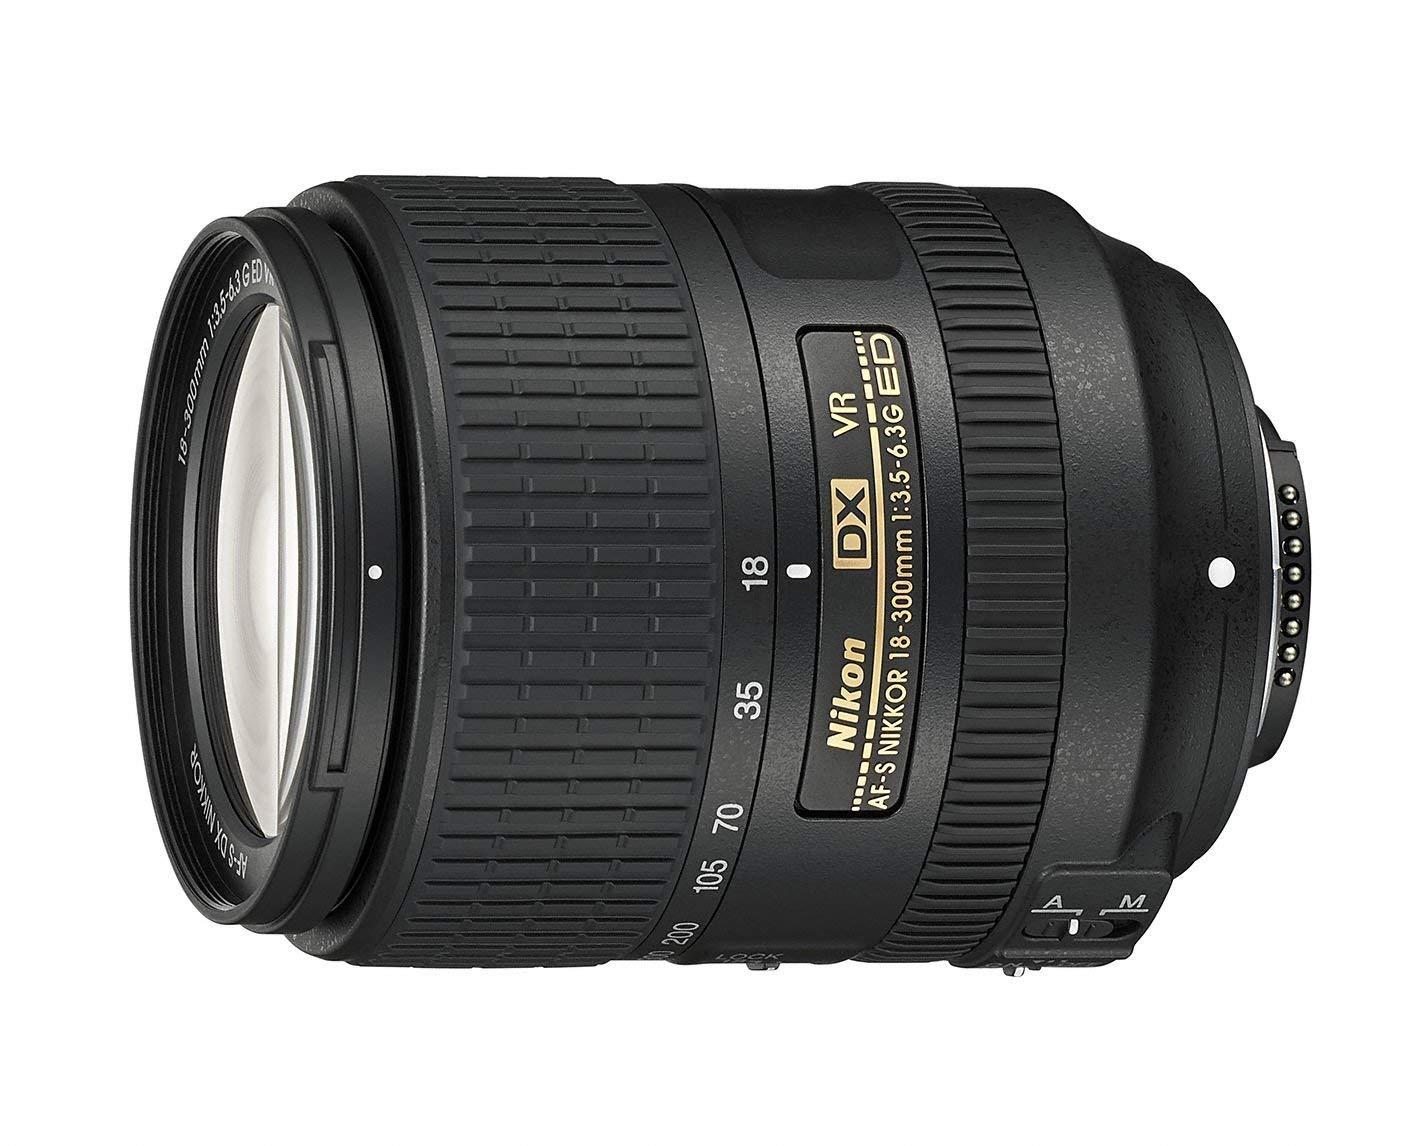 [Avides@Dealclub] Nikon Nikkor AF-S DX 18-300 mm 1:3,5-6,3G ED VR-Objektiv (inkl. LC-67 Frontdeckel und LF-4 Rückdeckel) schwarz - Vorführware -